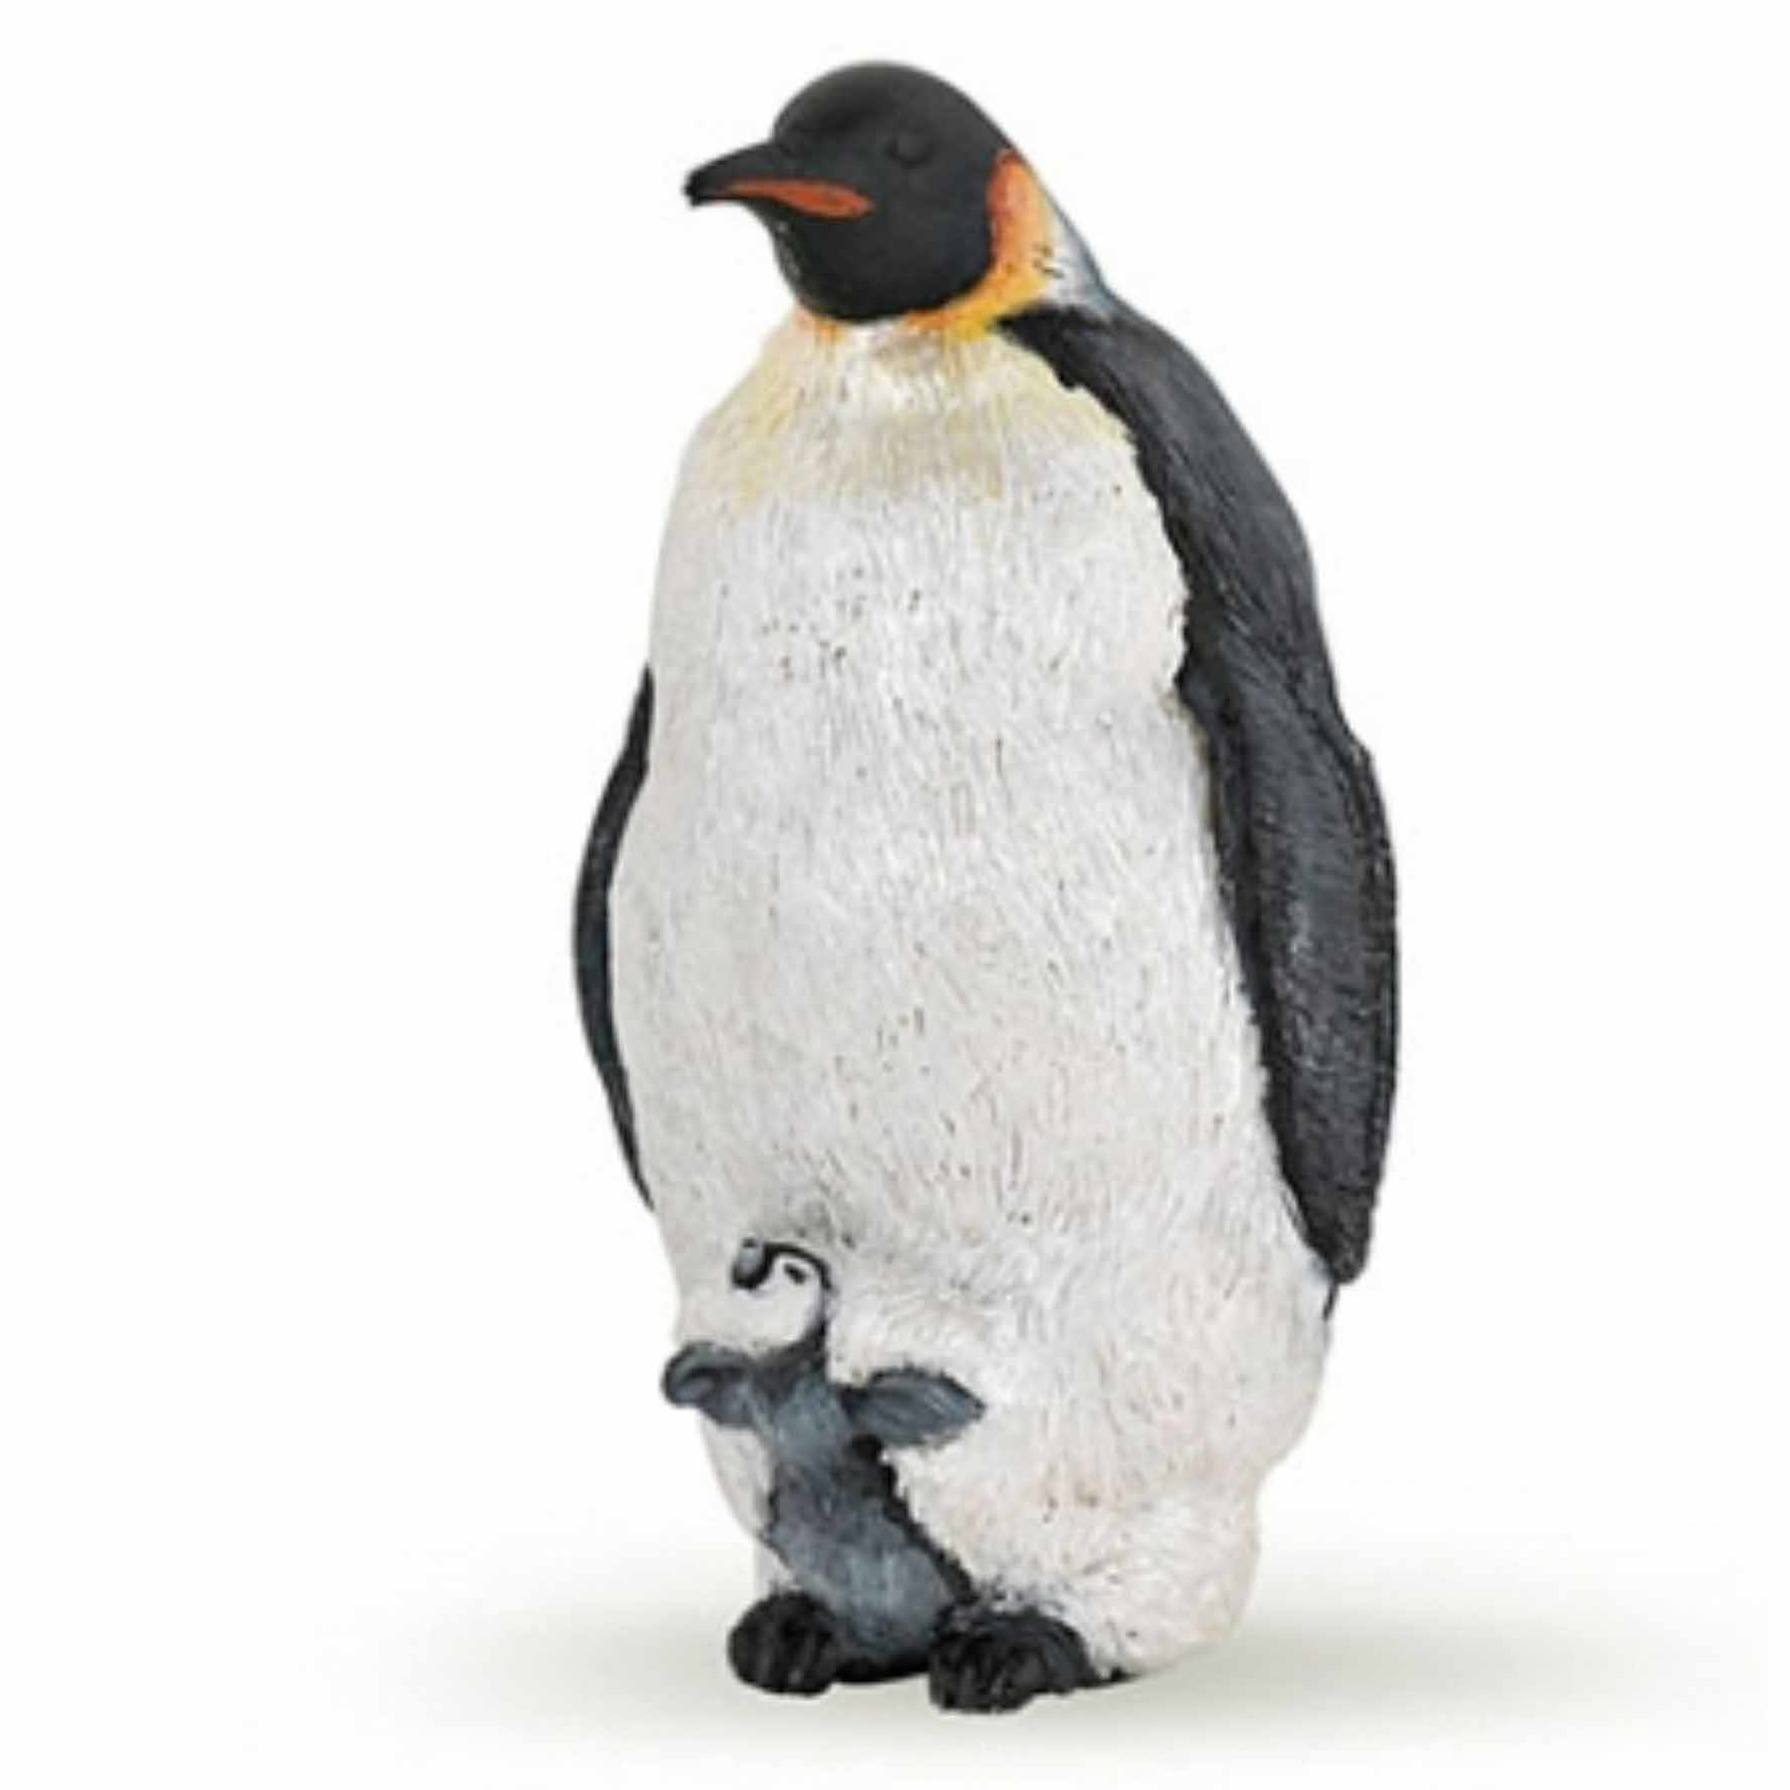 Speelfiguren sets Papo Plastic keizer pinguin 4 cm